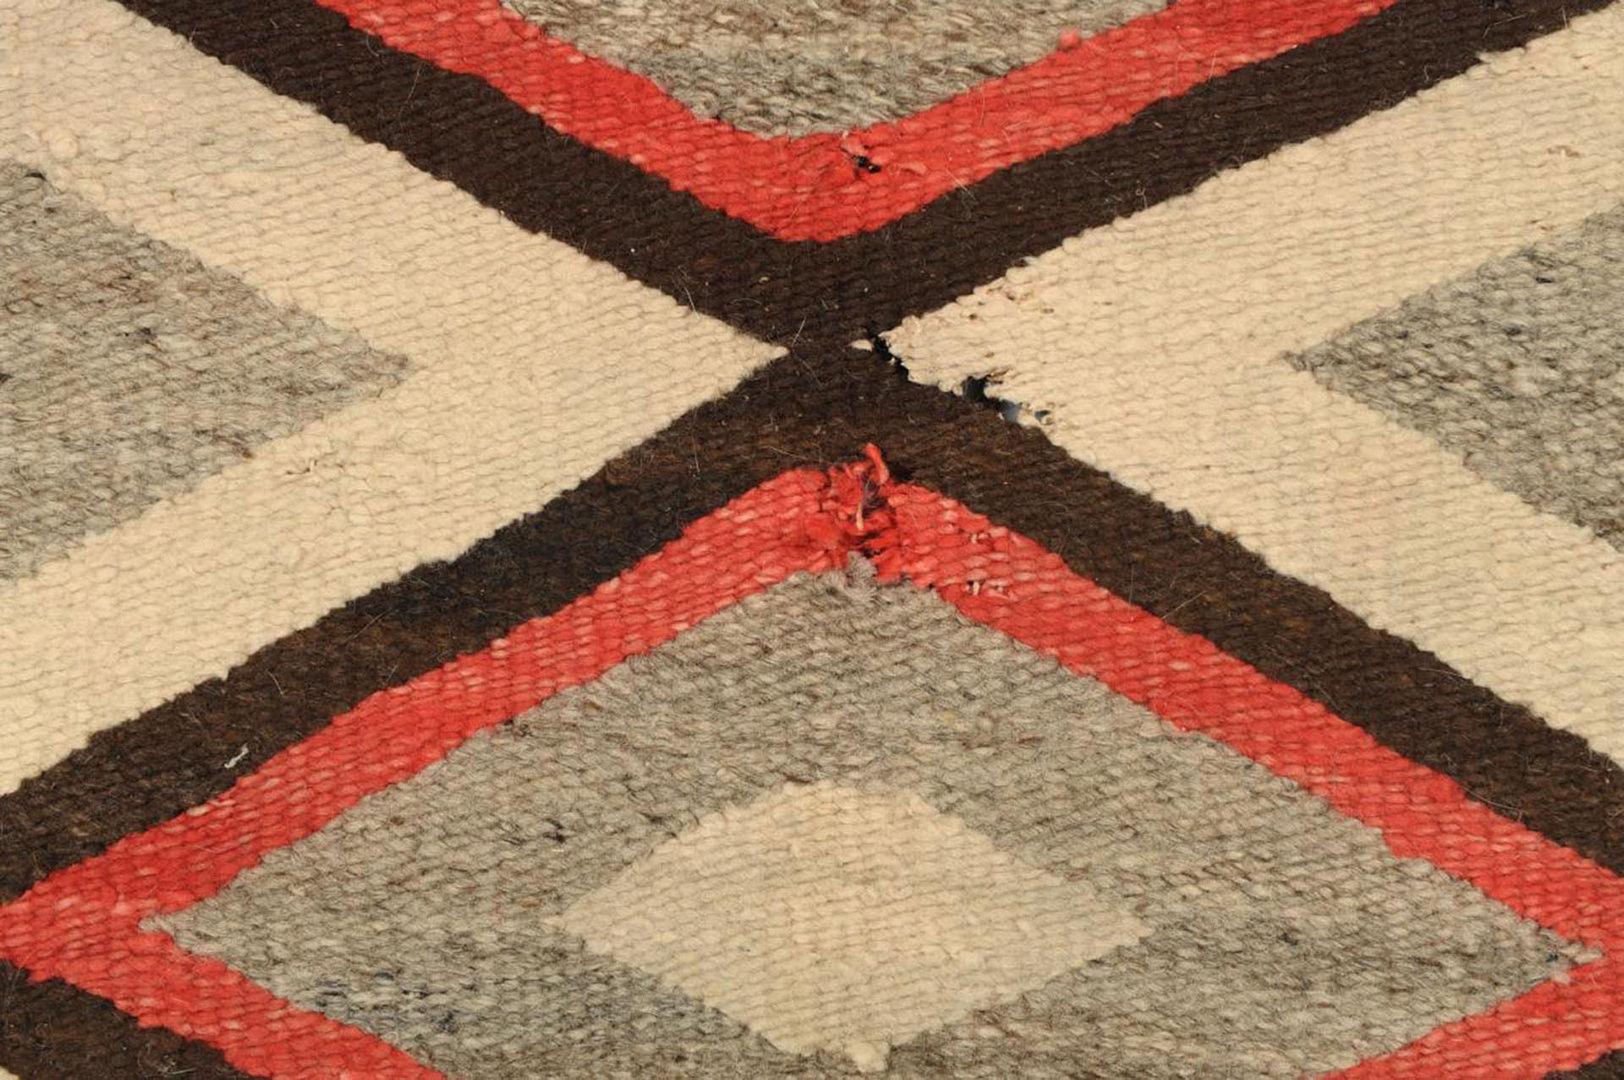 Lot 638: Navajo Blanket with Diamond Design